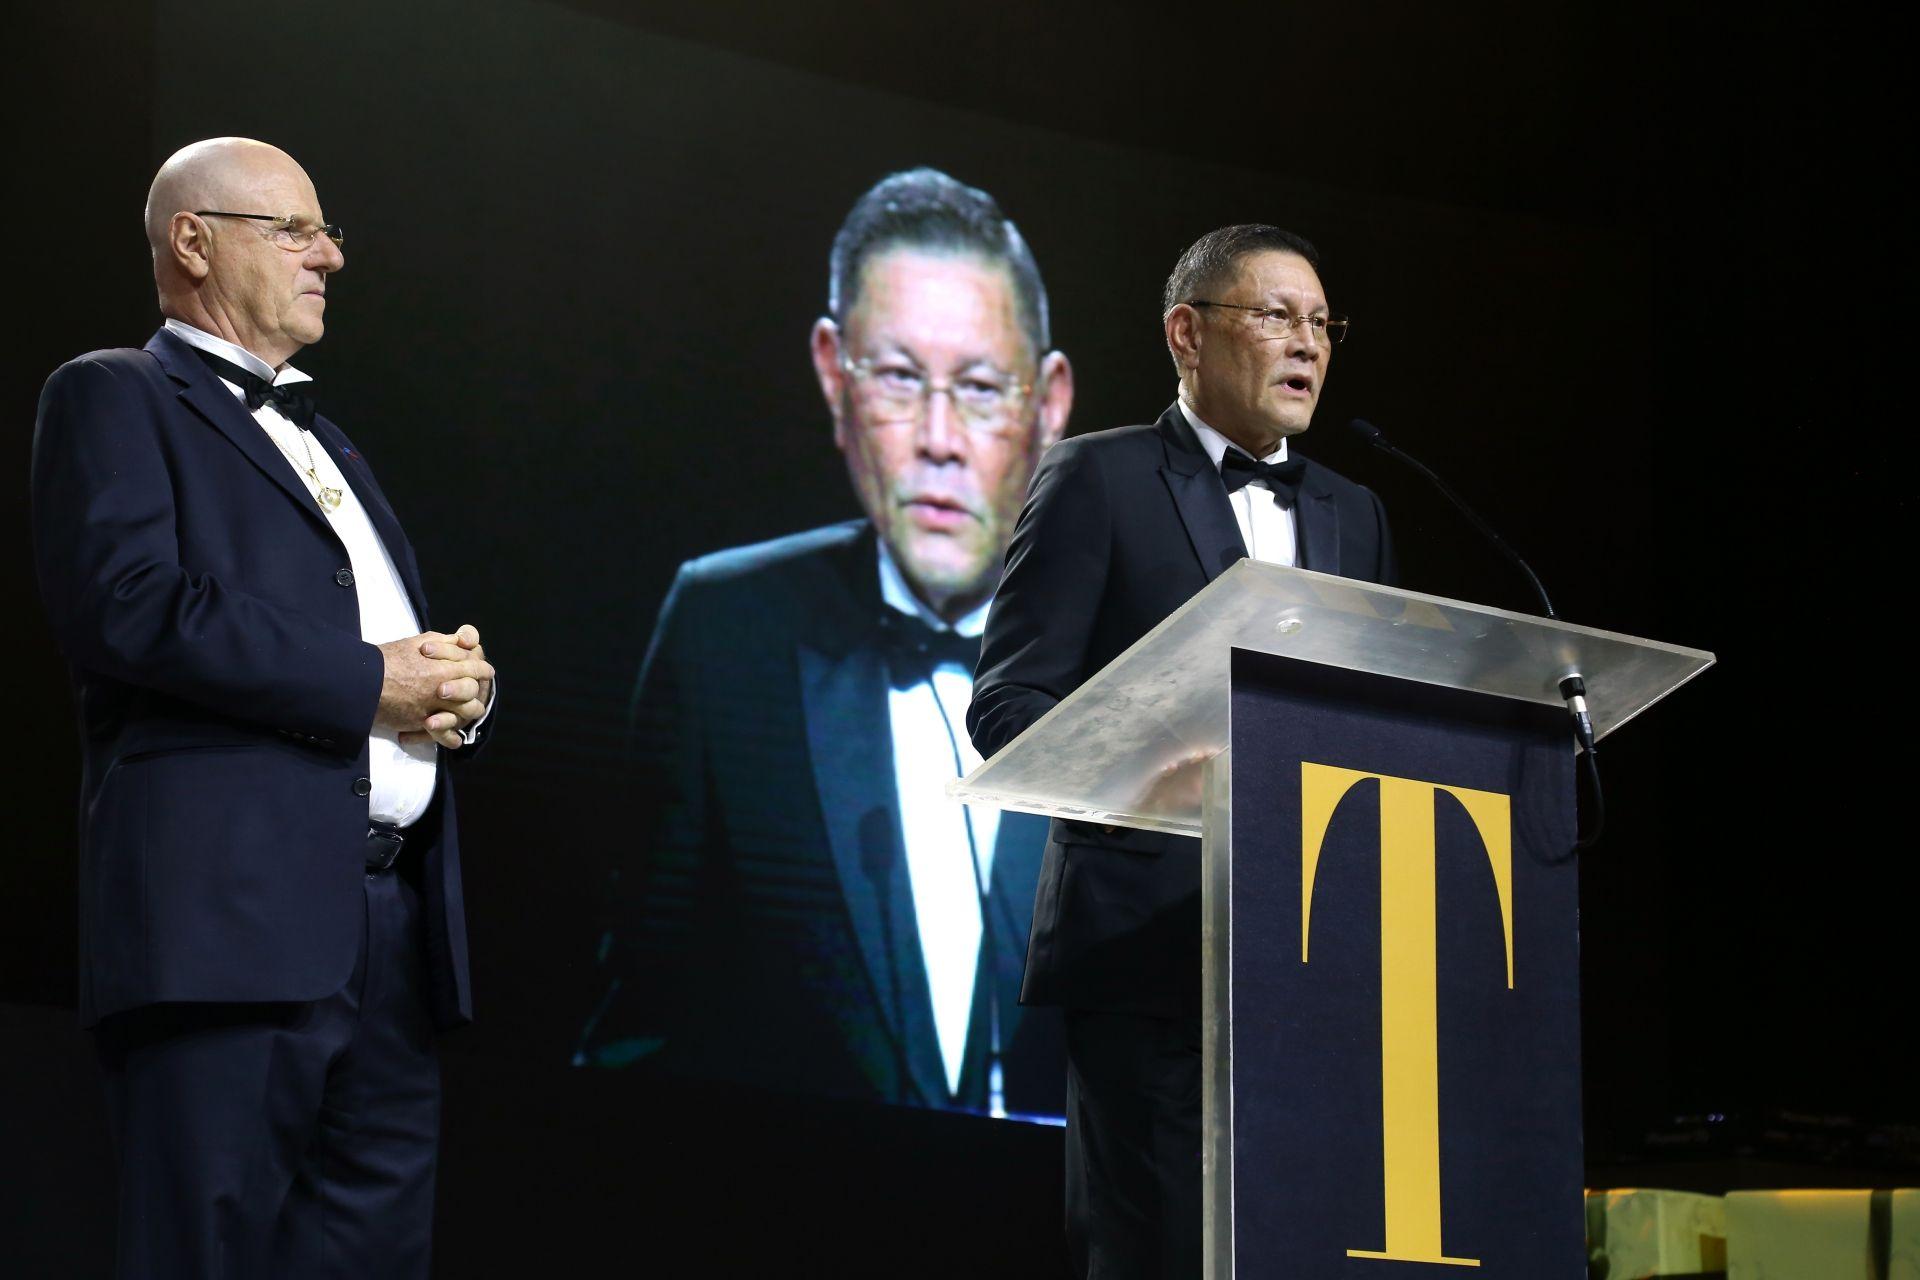 Manuel Cojuanco shares a touching speech